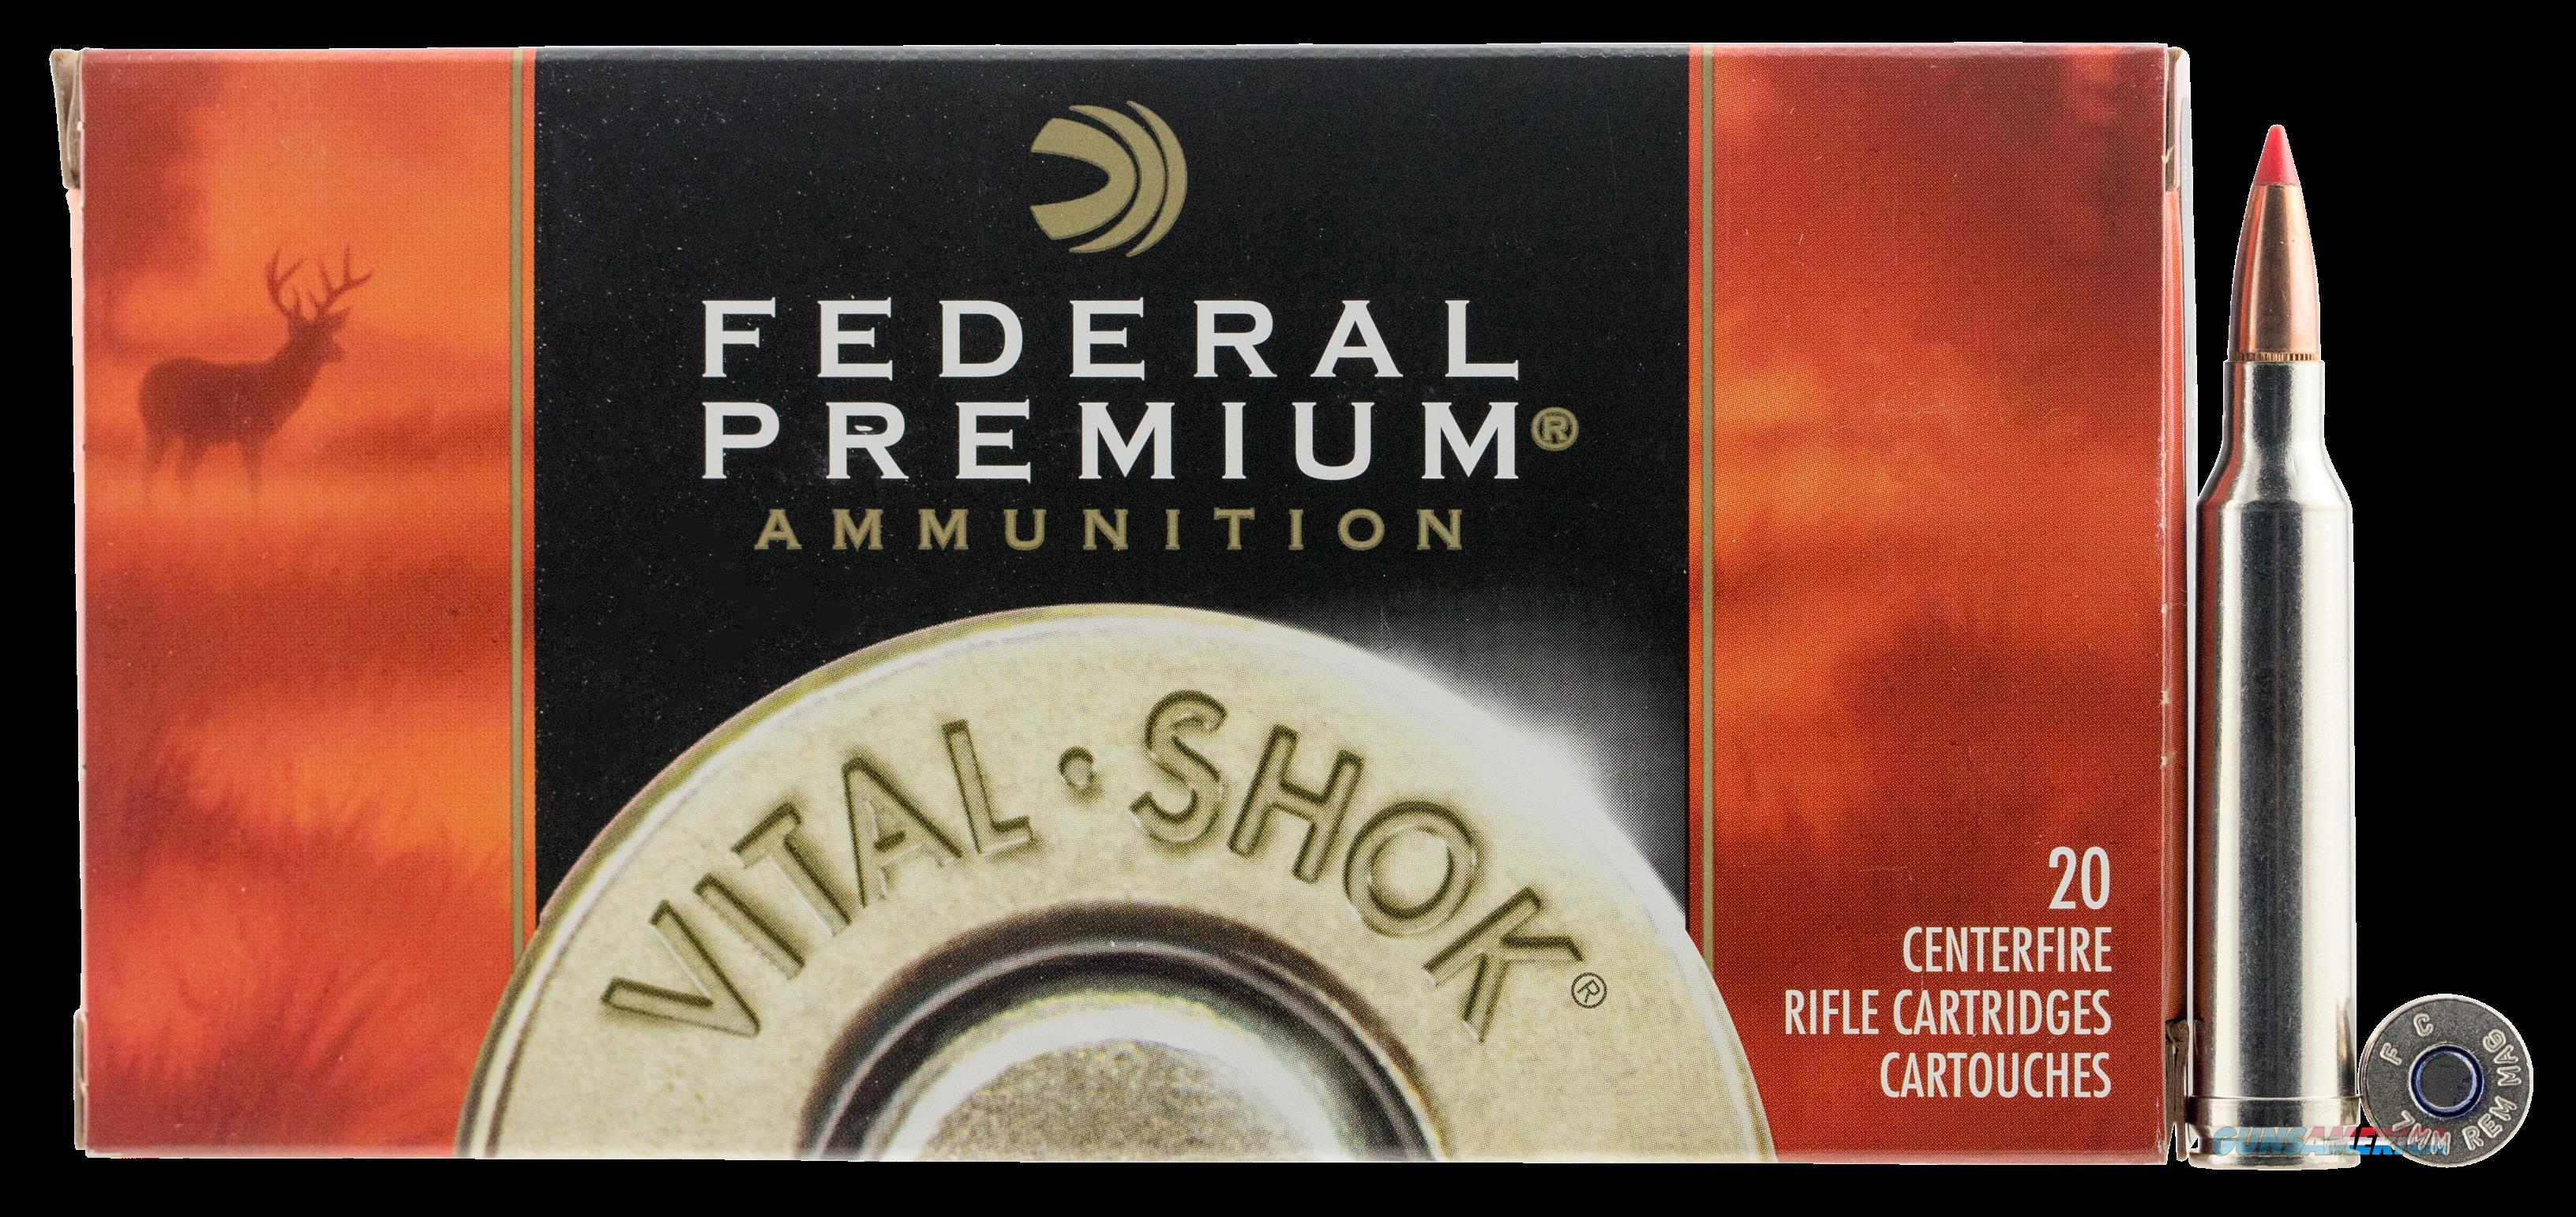 Federal Premium, Fed P7rh       7mm Mg 150 Nbt            20-10  Guns > Pistols > 1911 Pistol Copies (non-Colt)